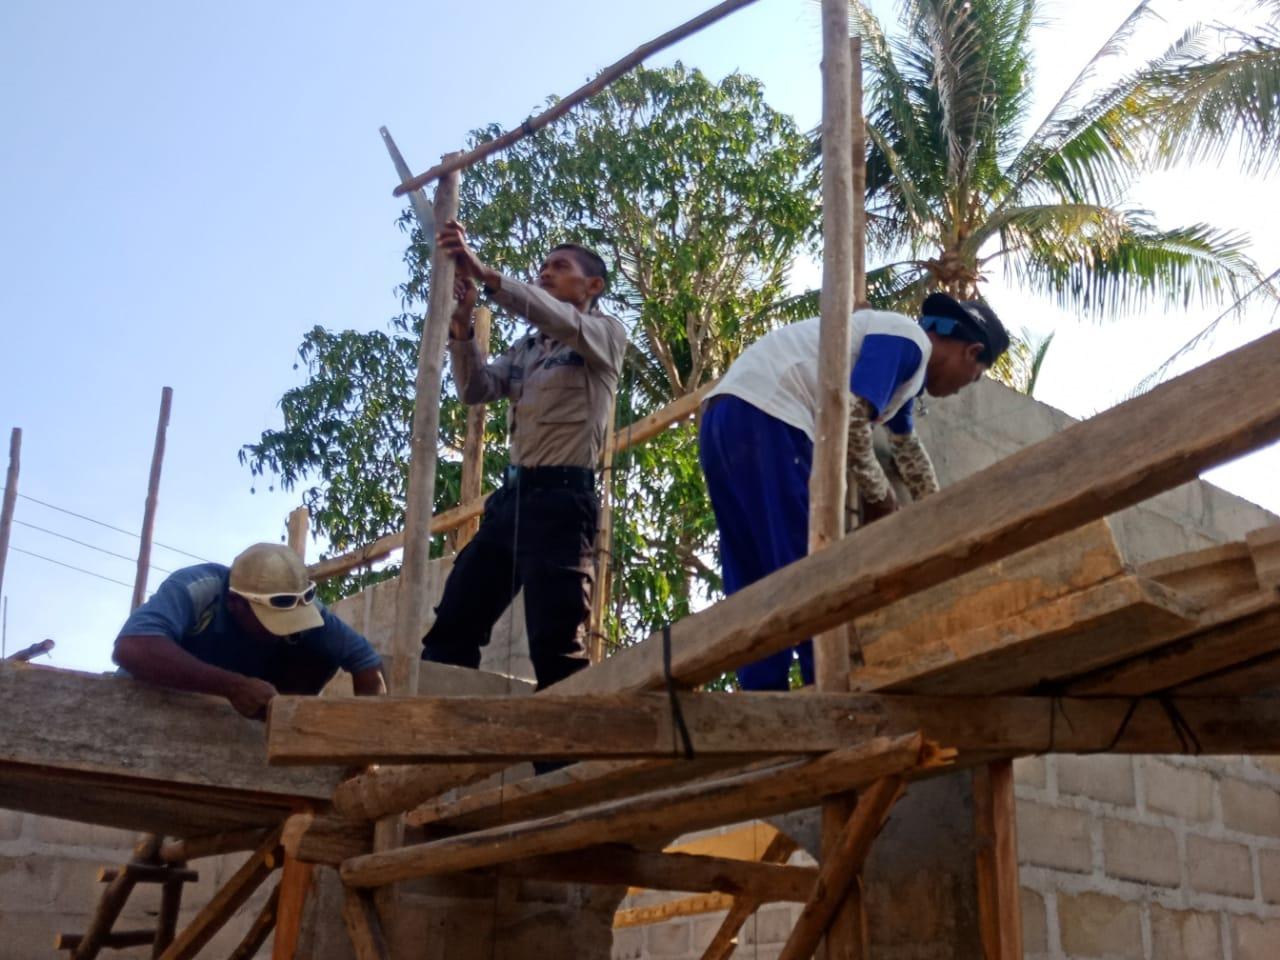 Bhabinkamtibmas Polsek Sulamu, Bripka Hermas Prasetyo bantu warga bangun rumah tinggal